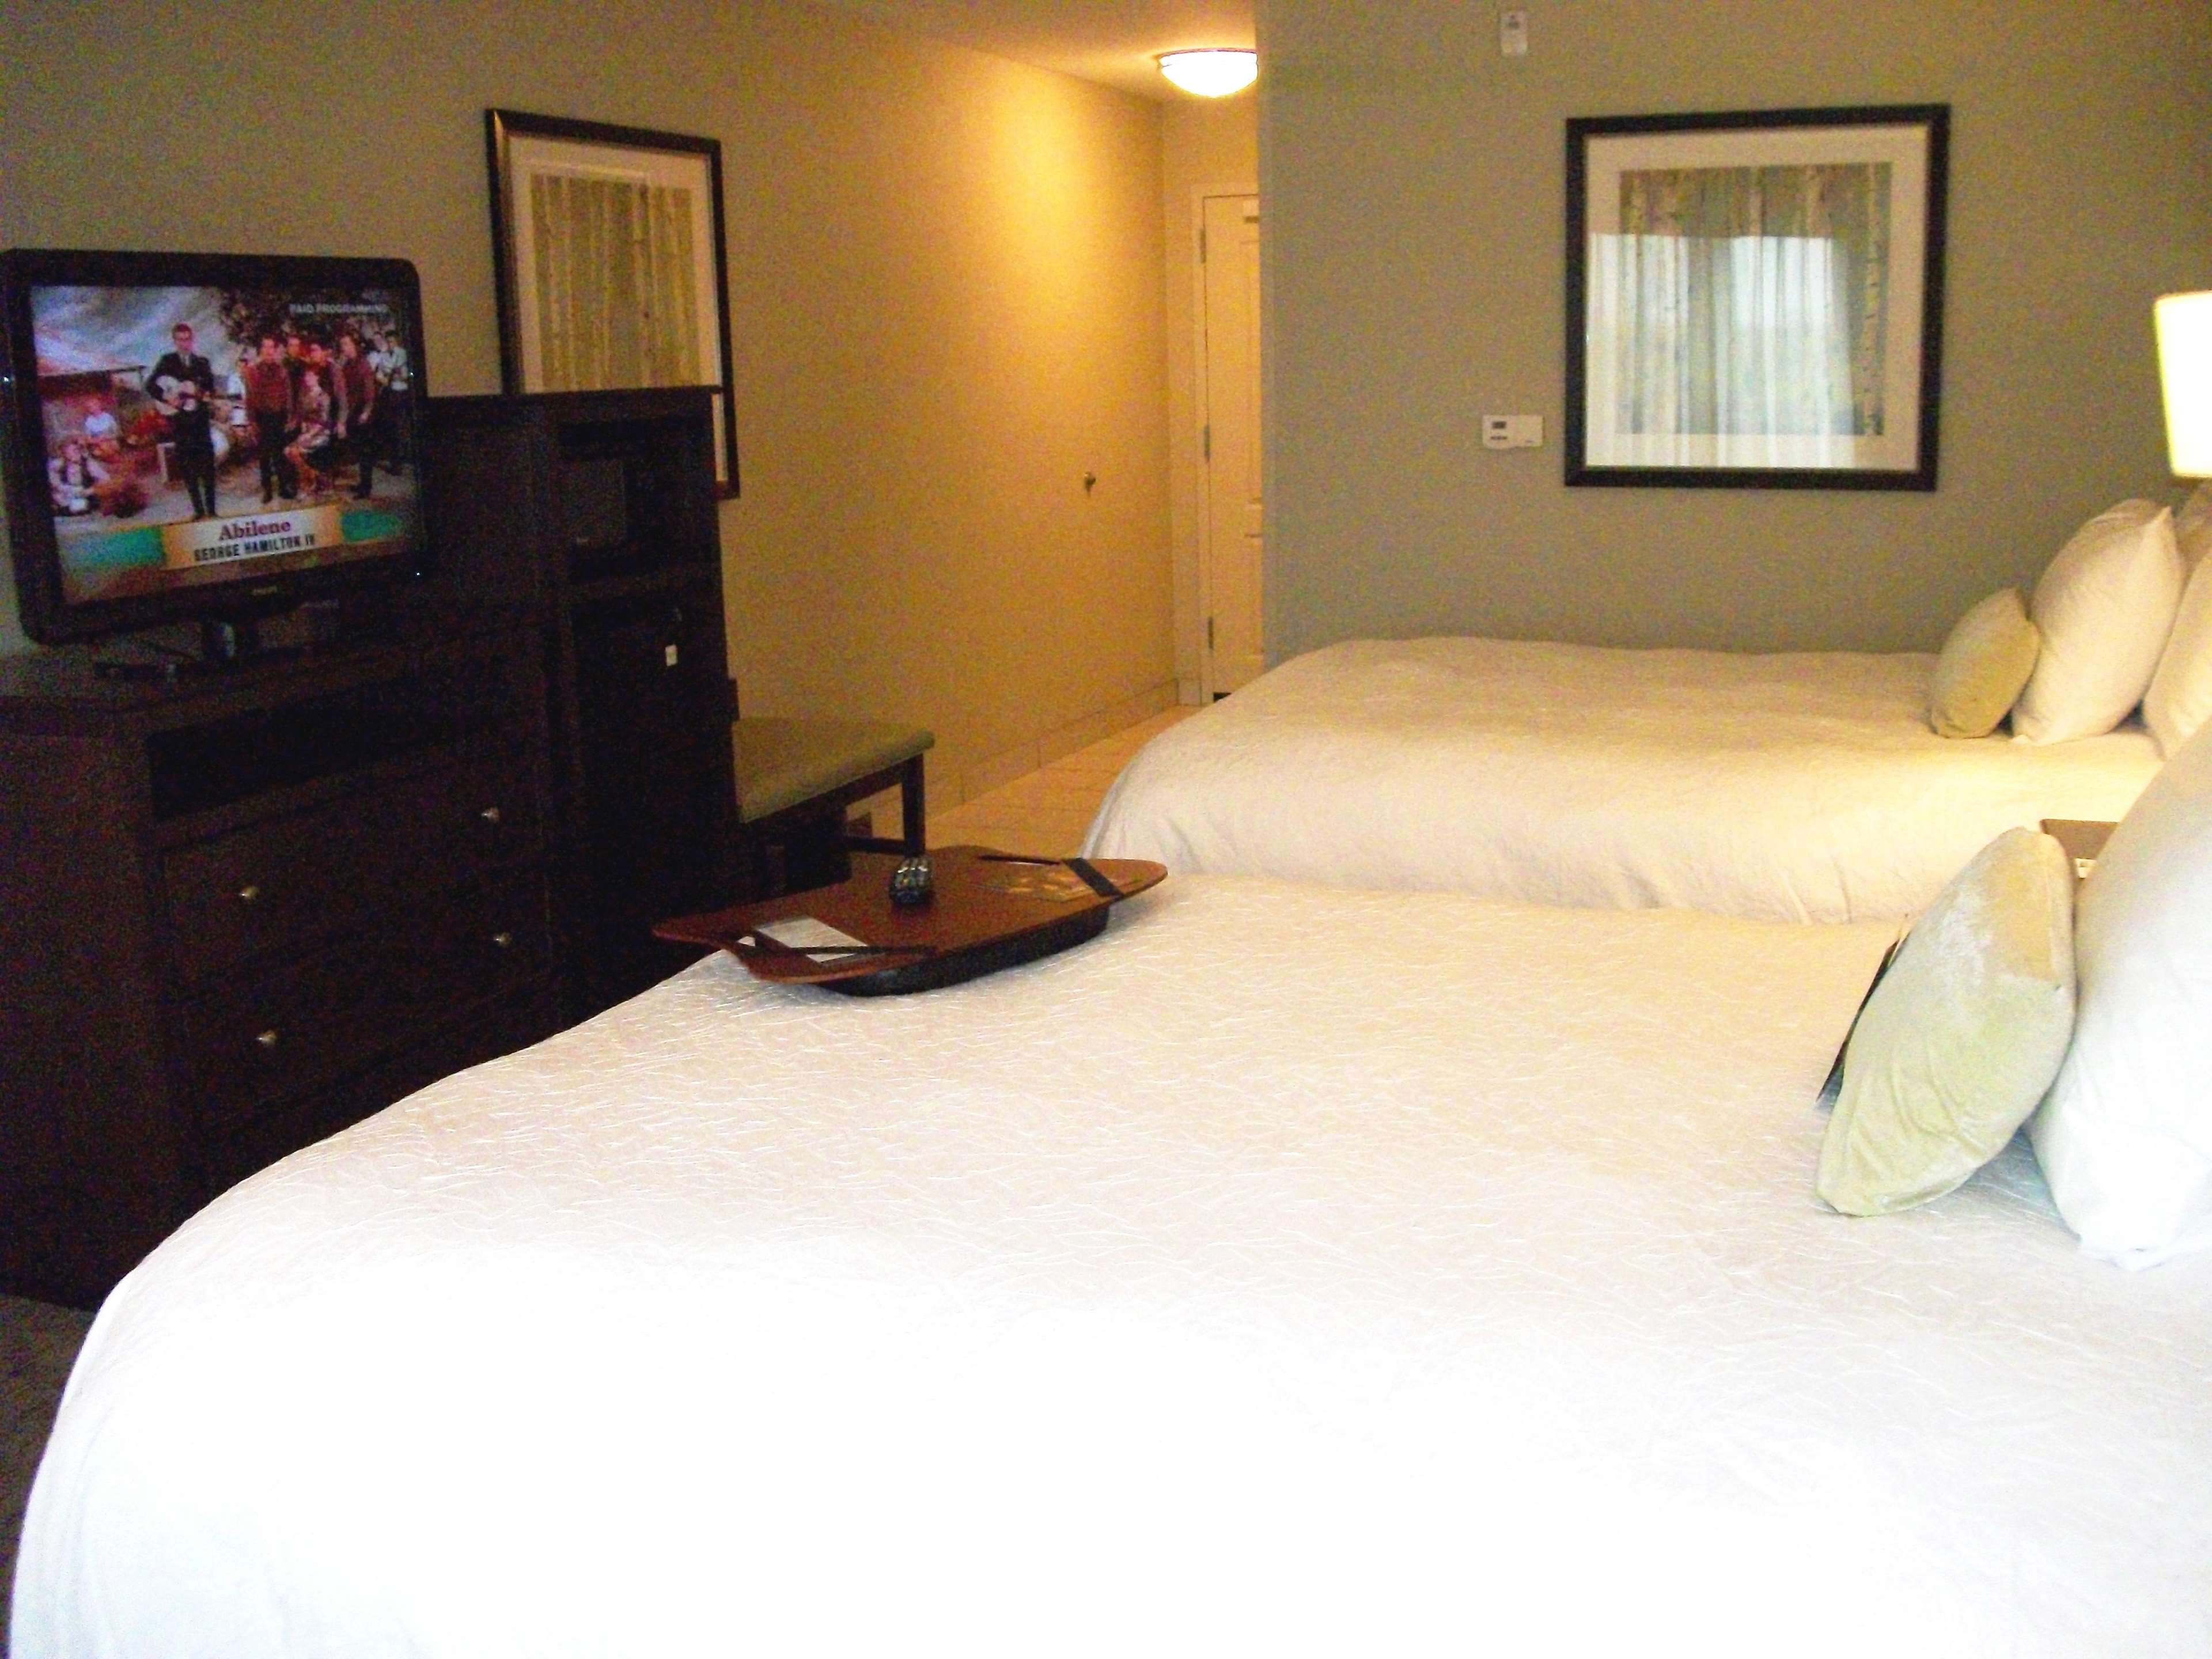 Hampton Inn & Suites Manteca image 45